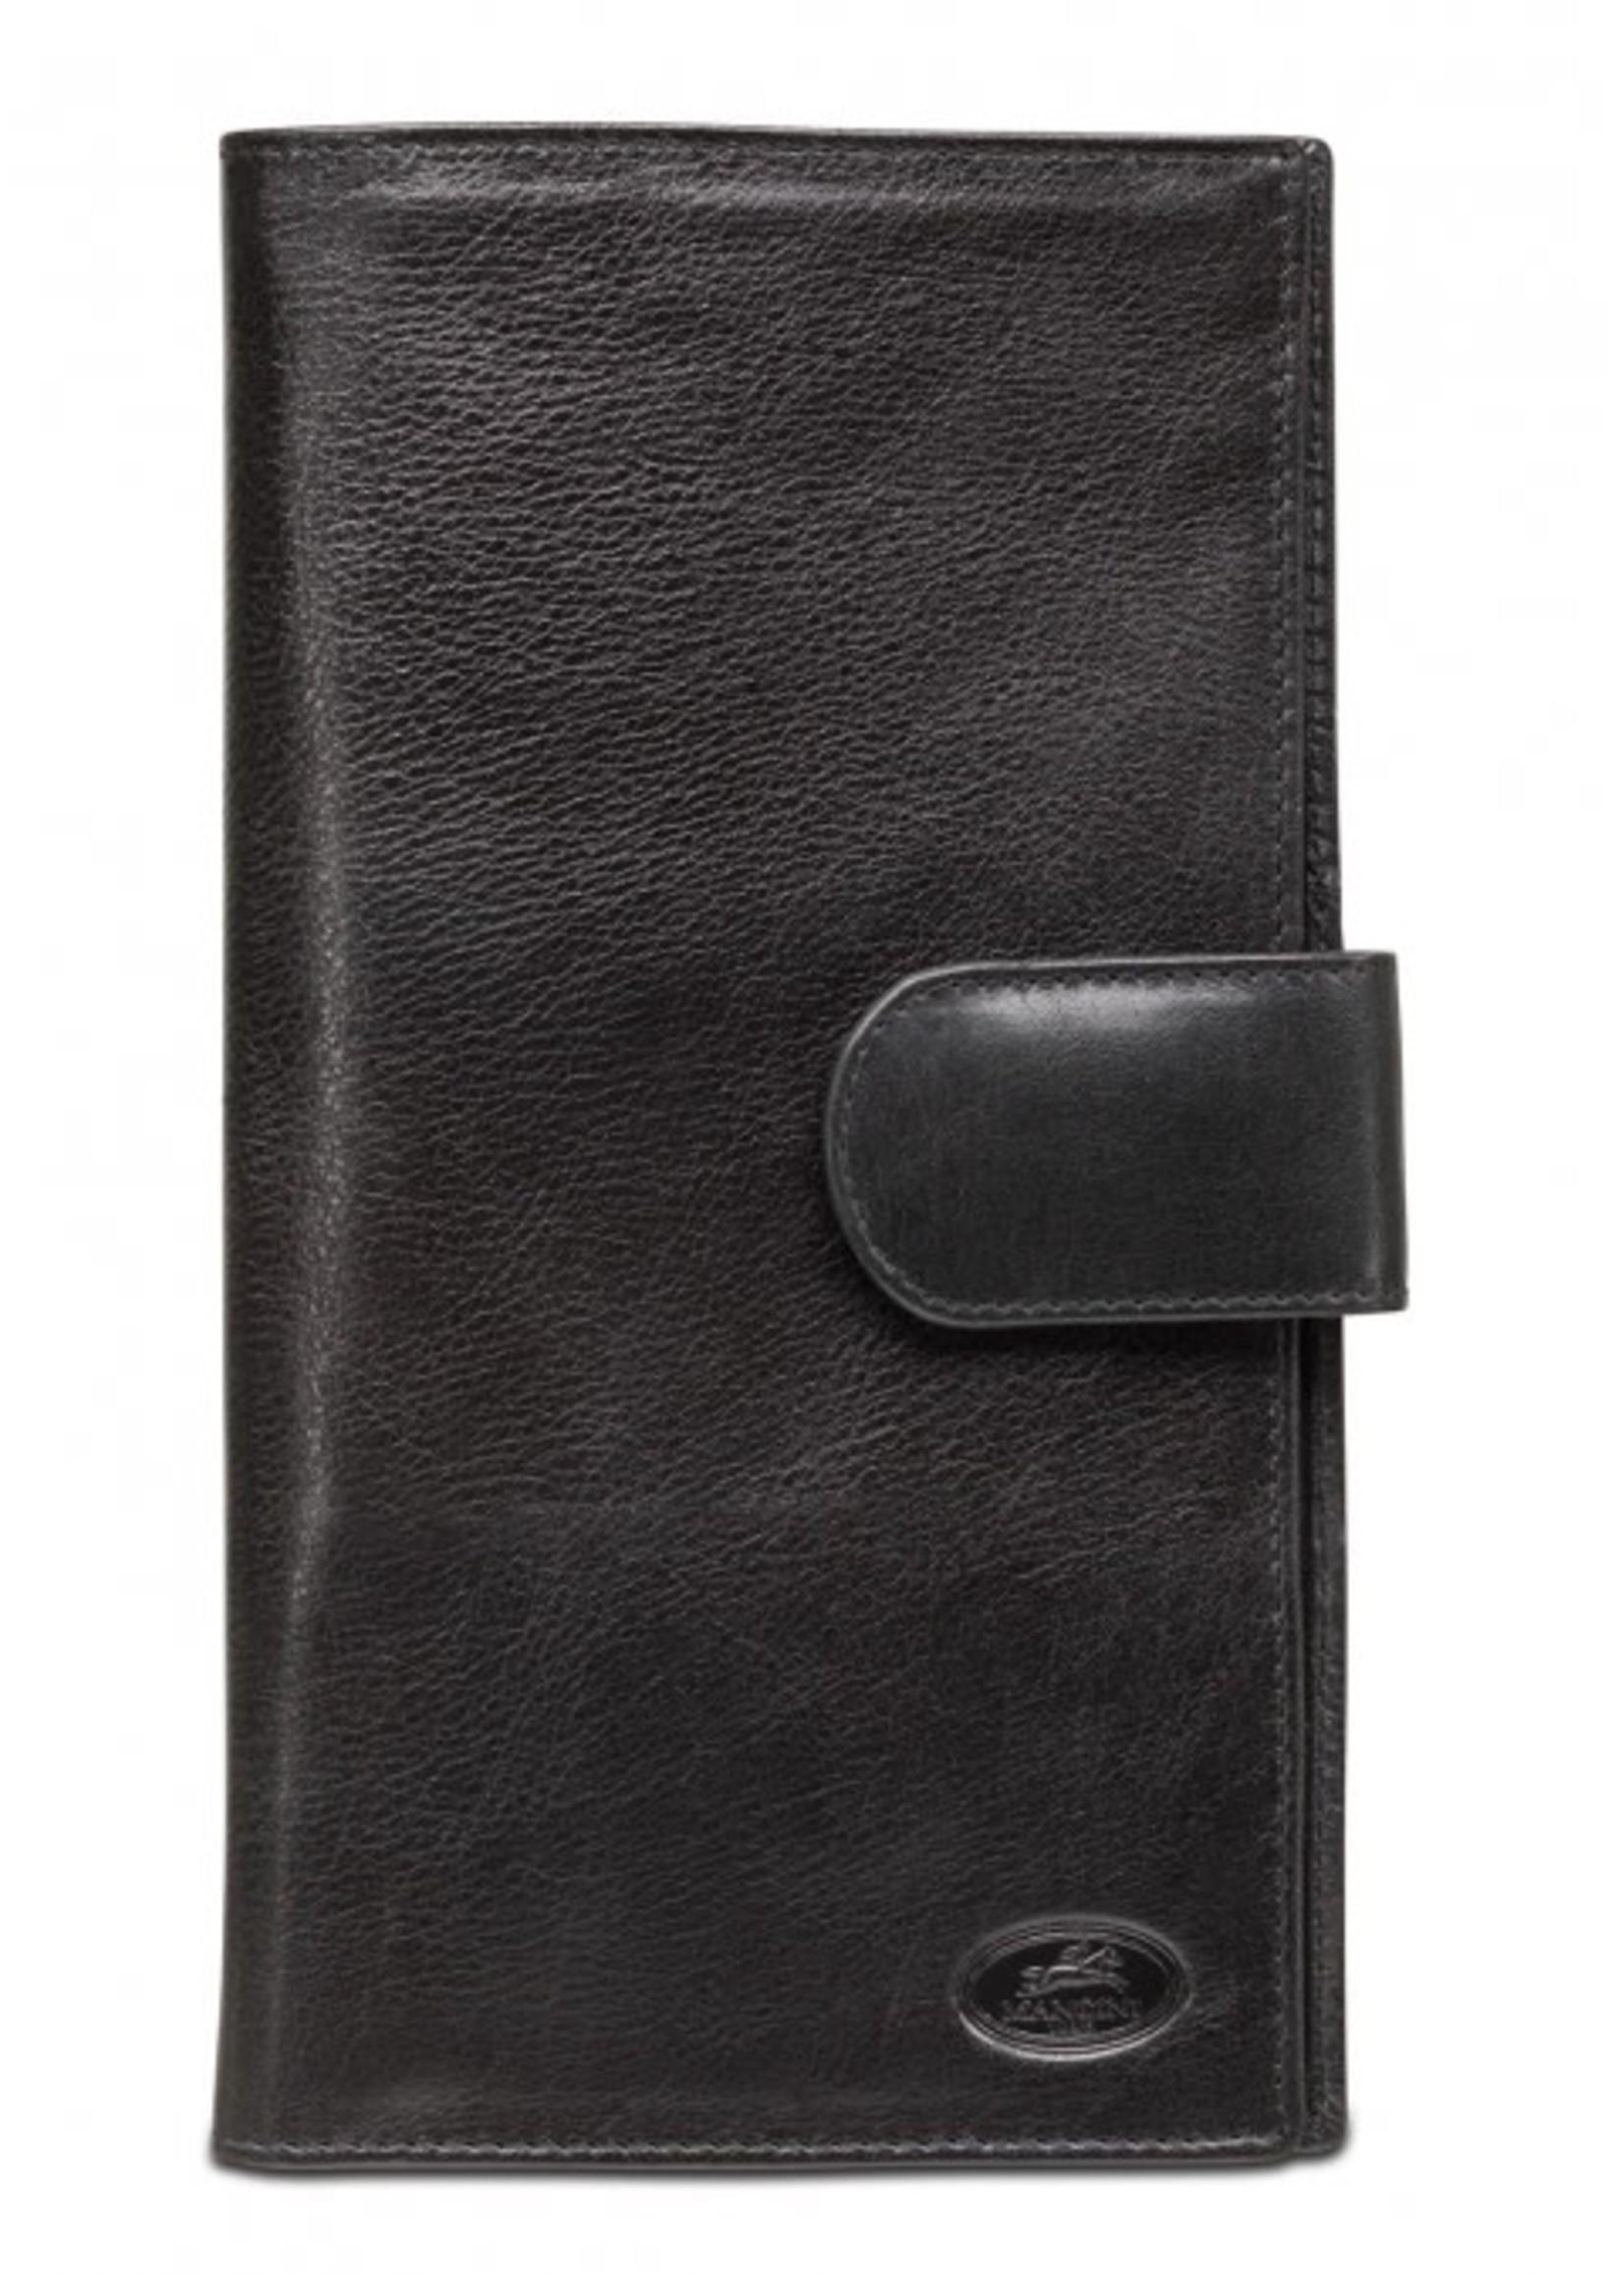 Mancini RFID Secure Classic Passport / Travel Organizer - Black